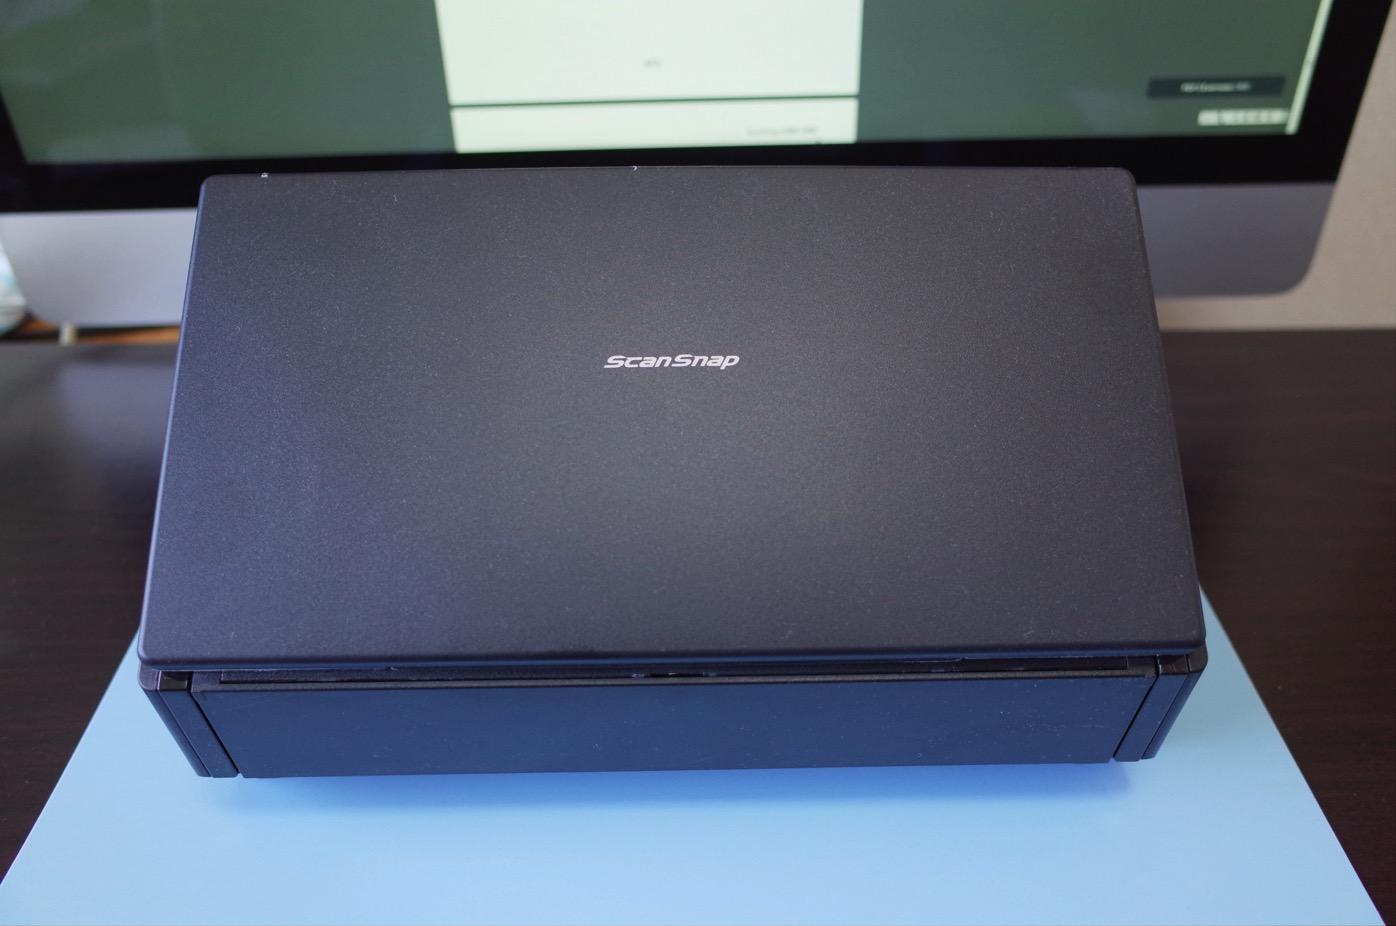 ScanSnap iX500-1